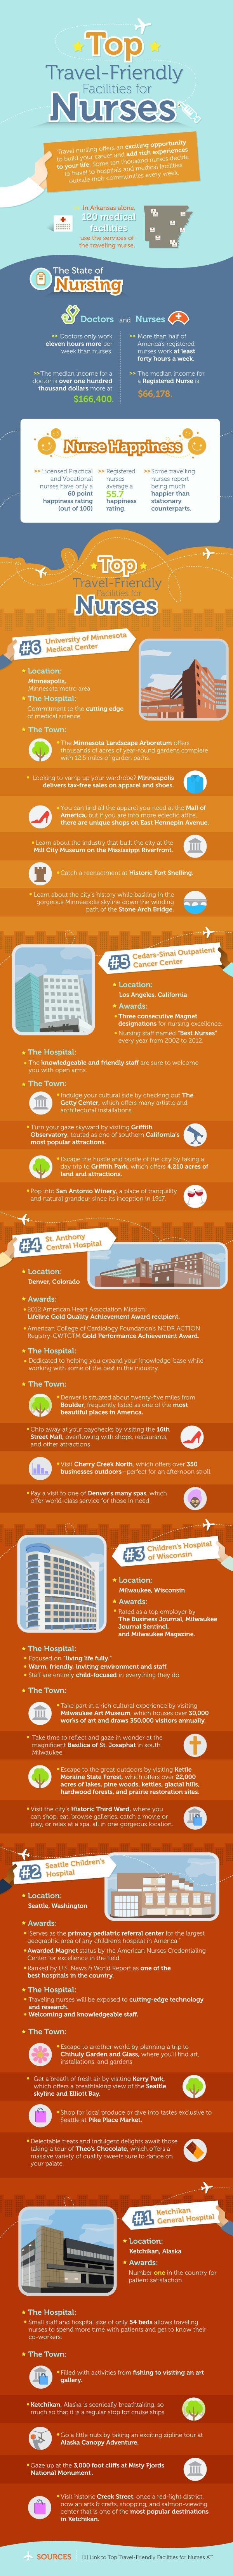 The Top Travel Friendly Facilities For Nurses. #nurse #career